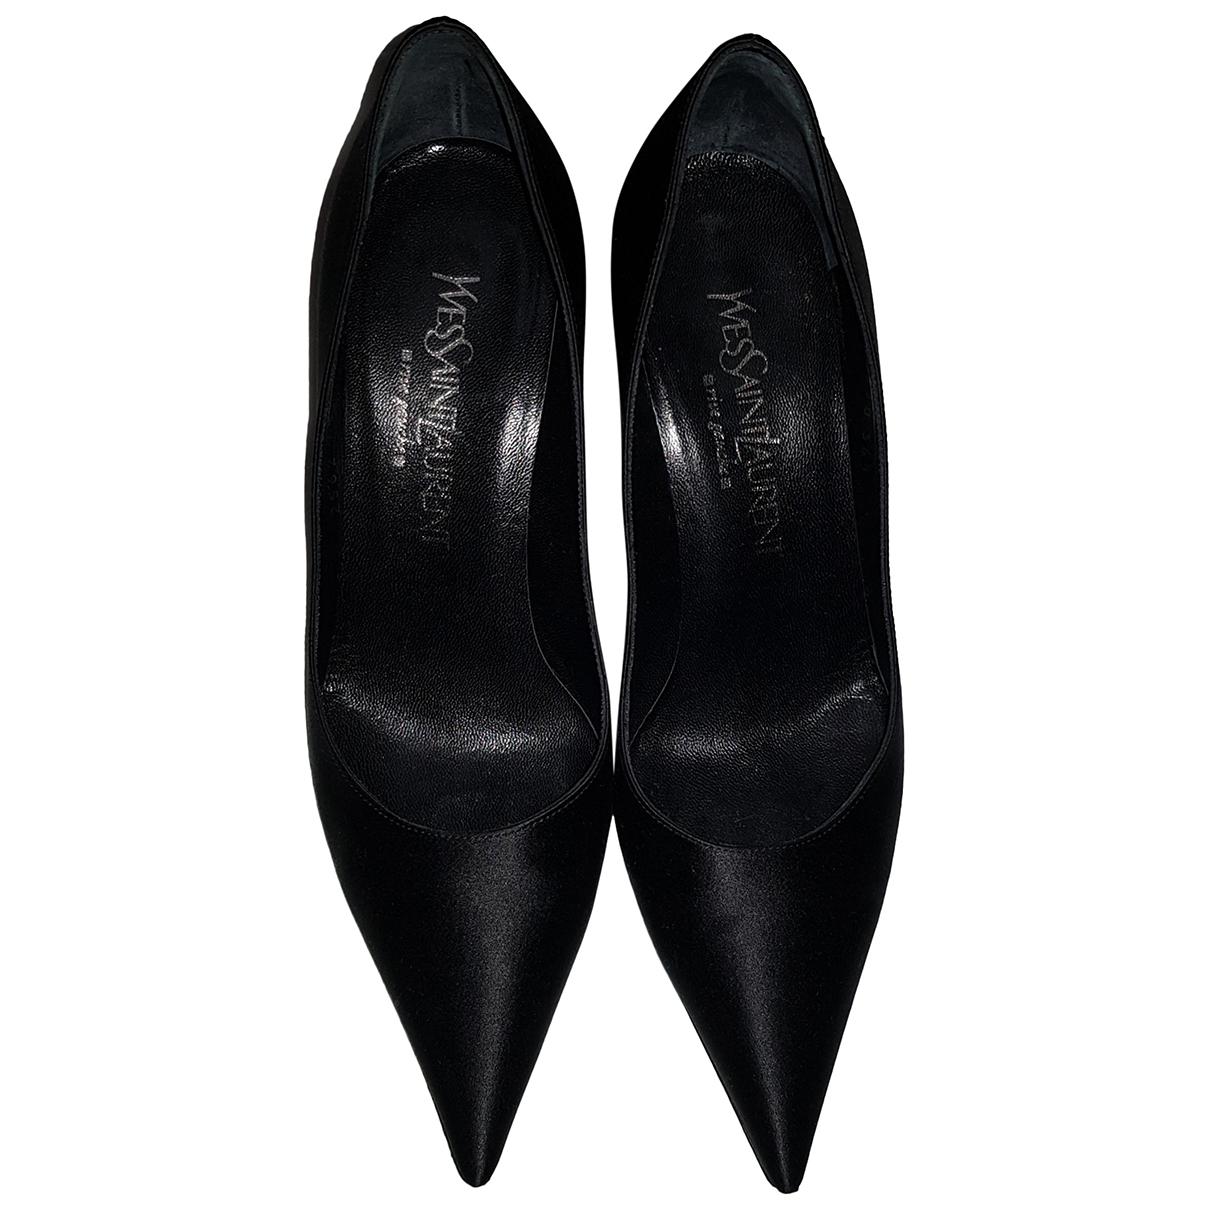 Yves Saint Laurent \N Pumps in  Schwarz Leder